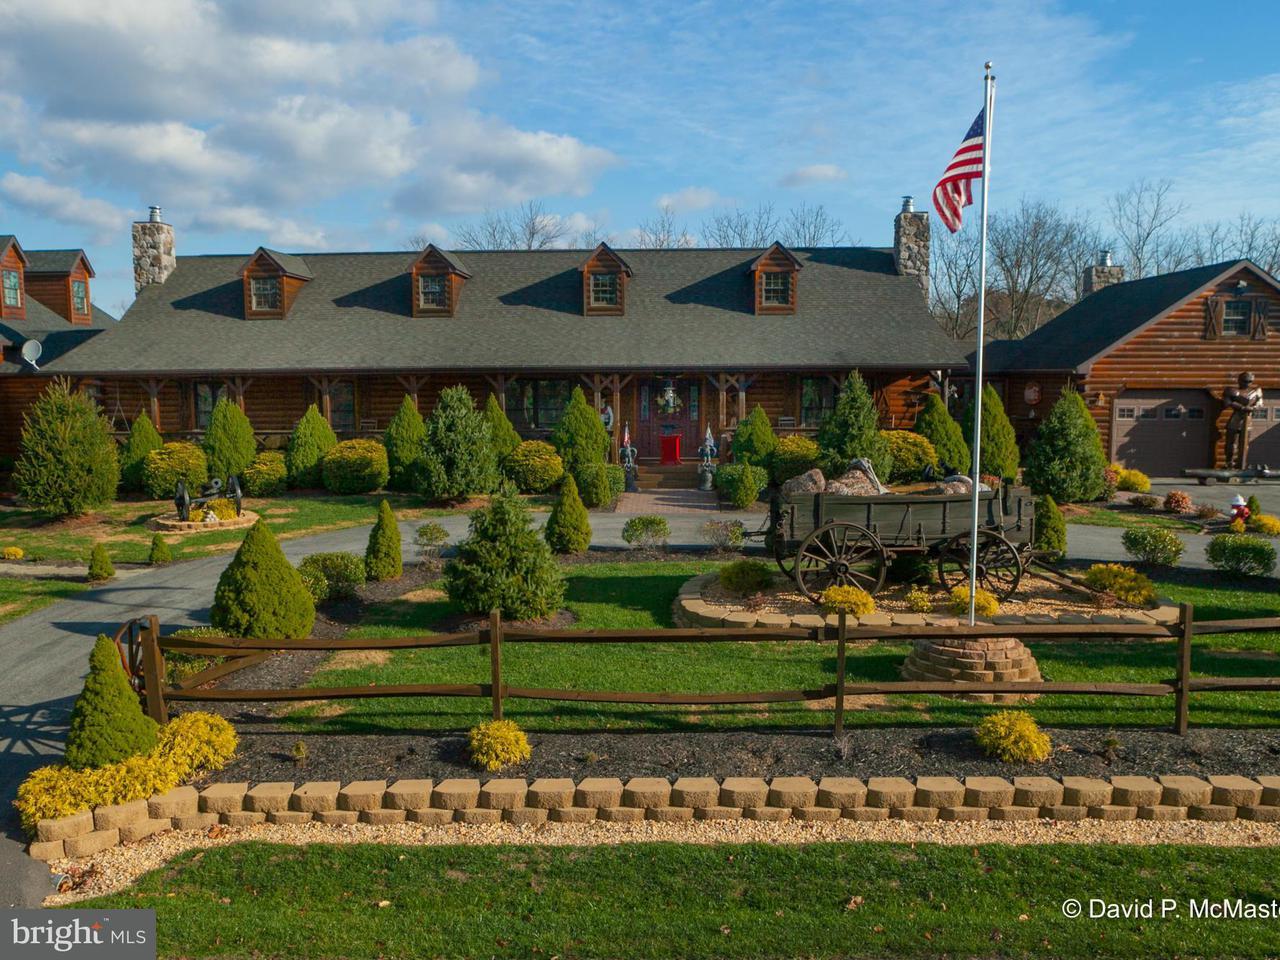 独户住宅 为 销售 在 47 Sweetbriar Road 47 Sweetbriar Road Martinsburg, 西弗吉尼亚州 25405 美国